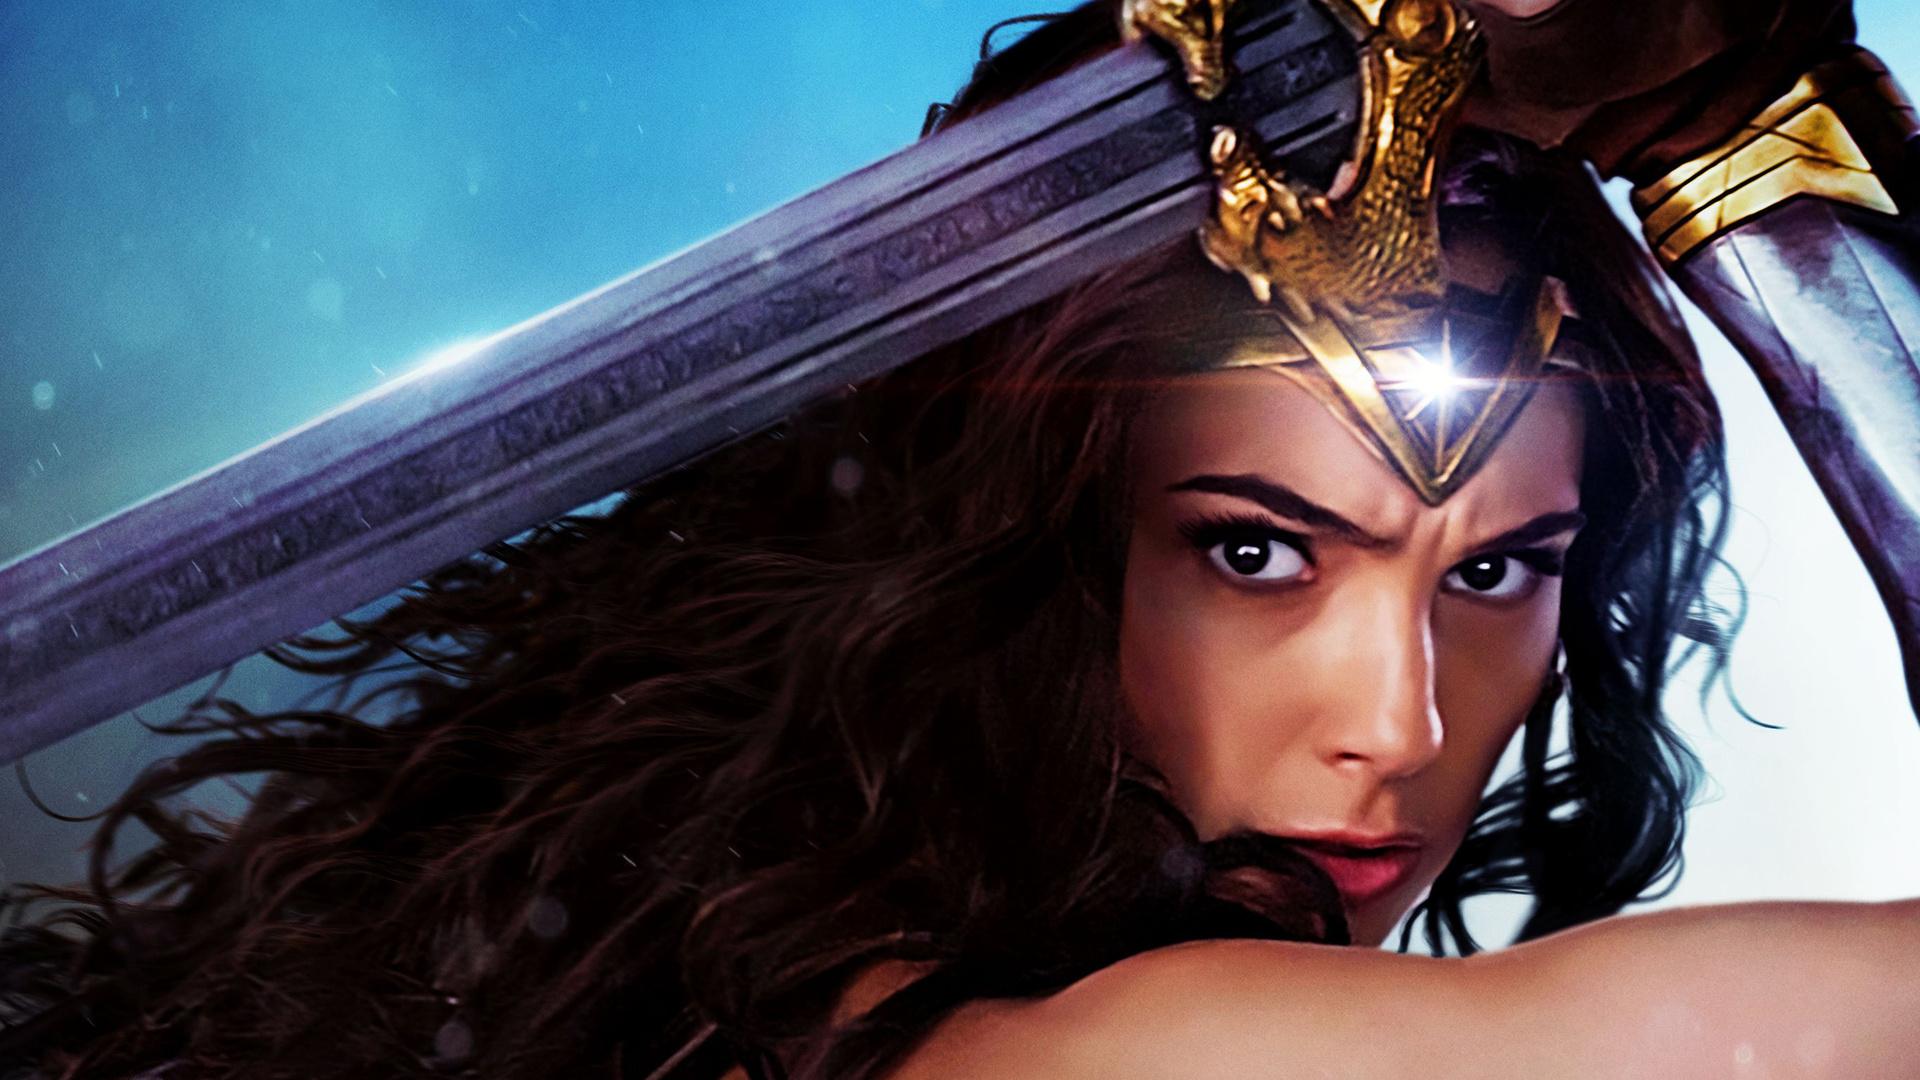 Wallpaper Gal Gadot Wonder Woman 2017 Movies Hd Movies: 1920x1080 Gal Gadot Wonder Woman Movie 2017 Laptop Full HD